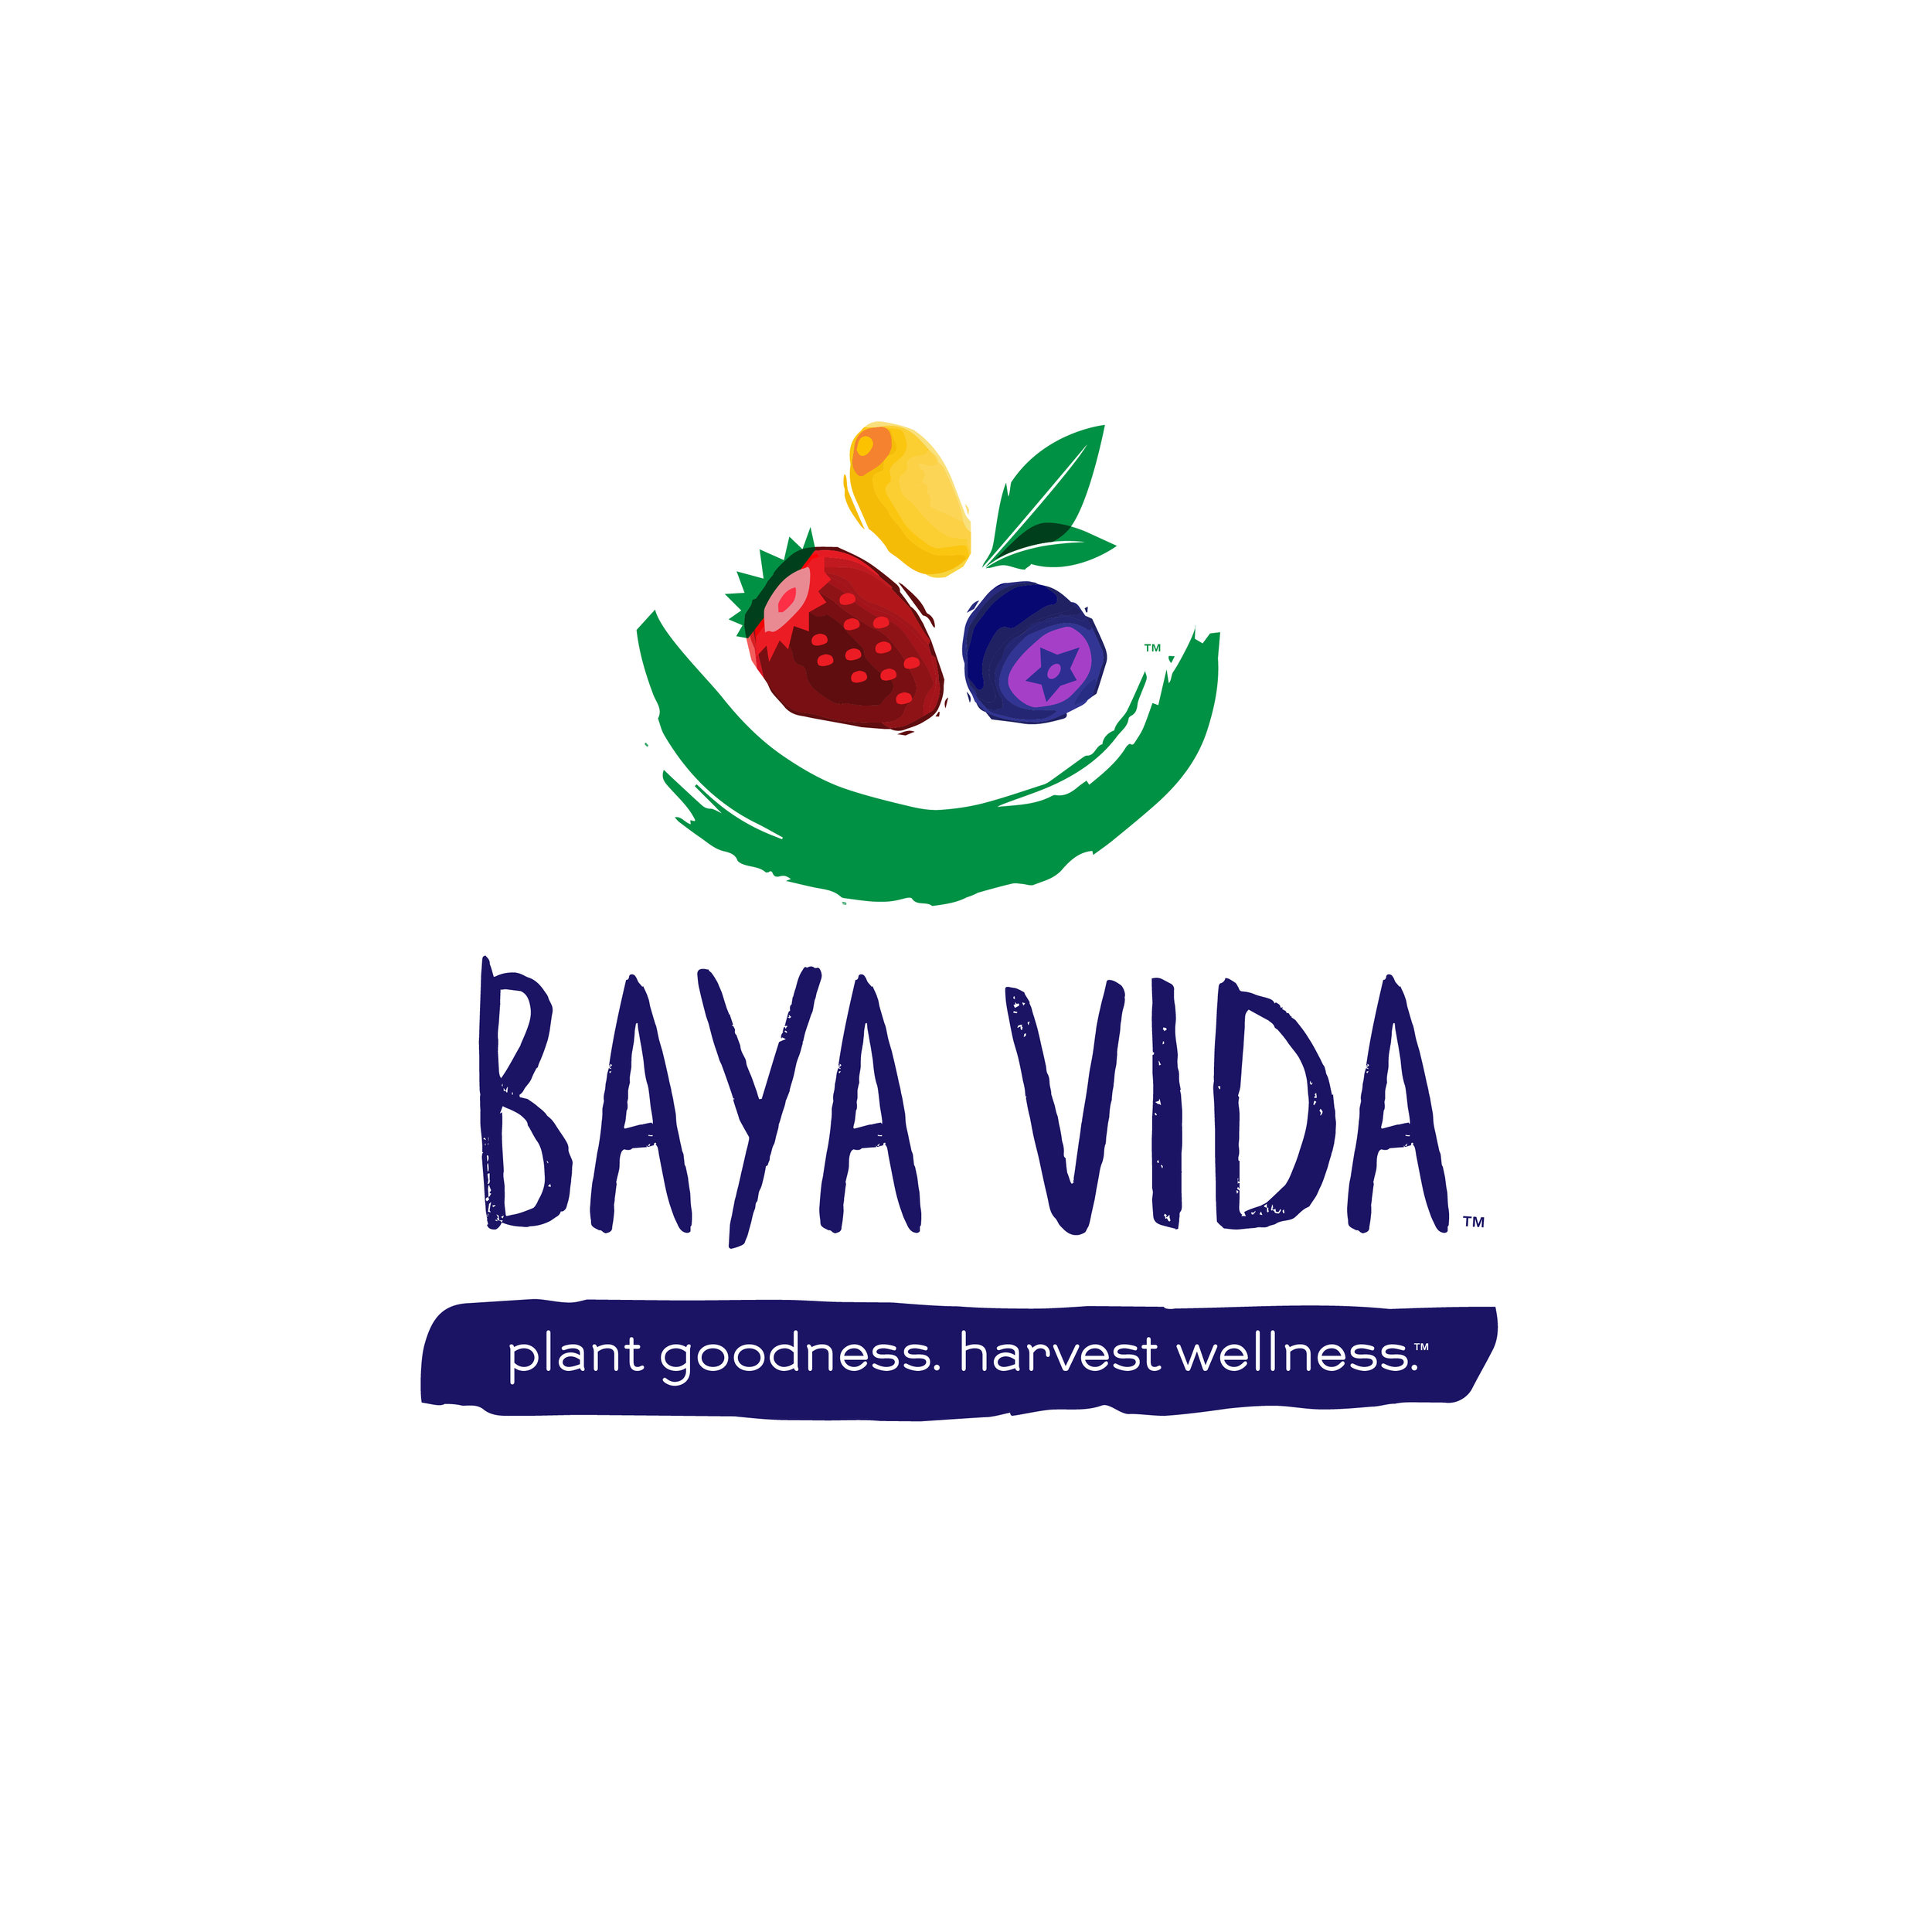 bayavida.jpg